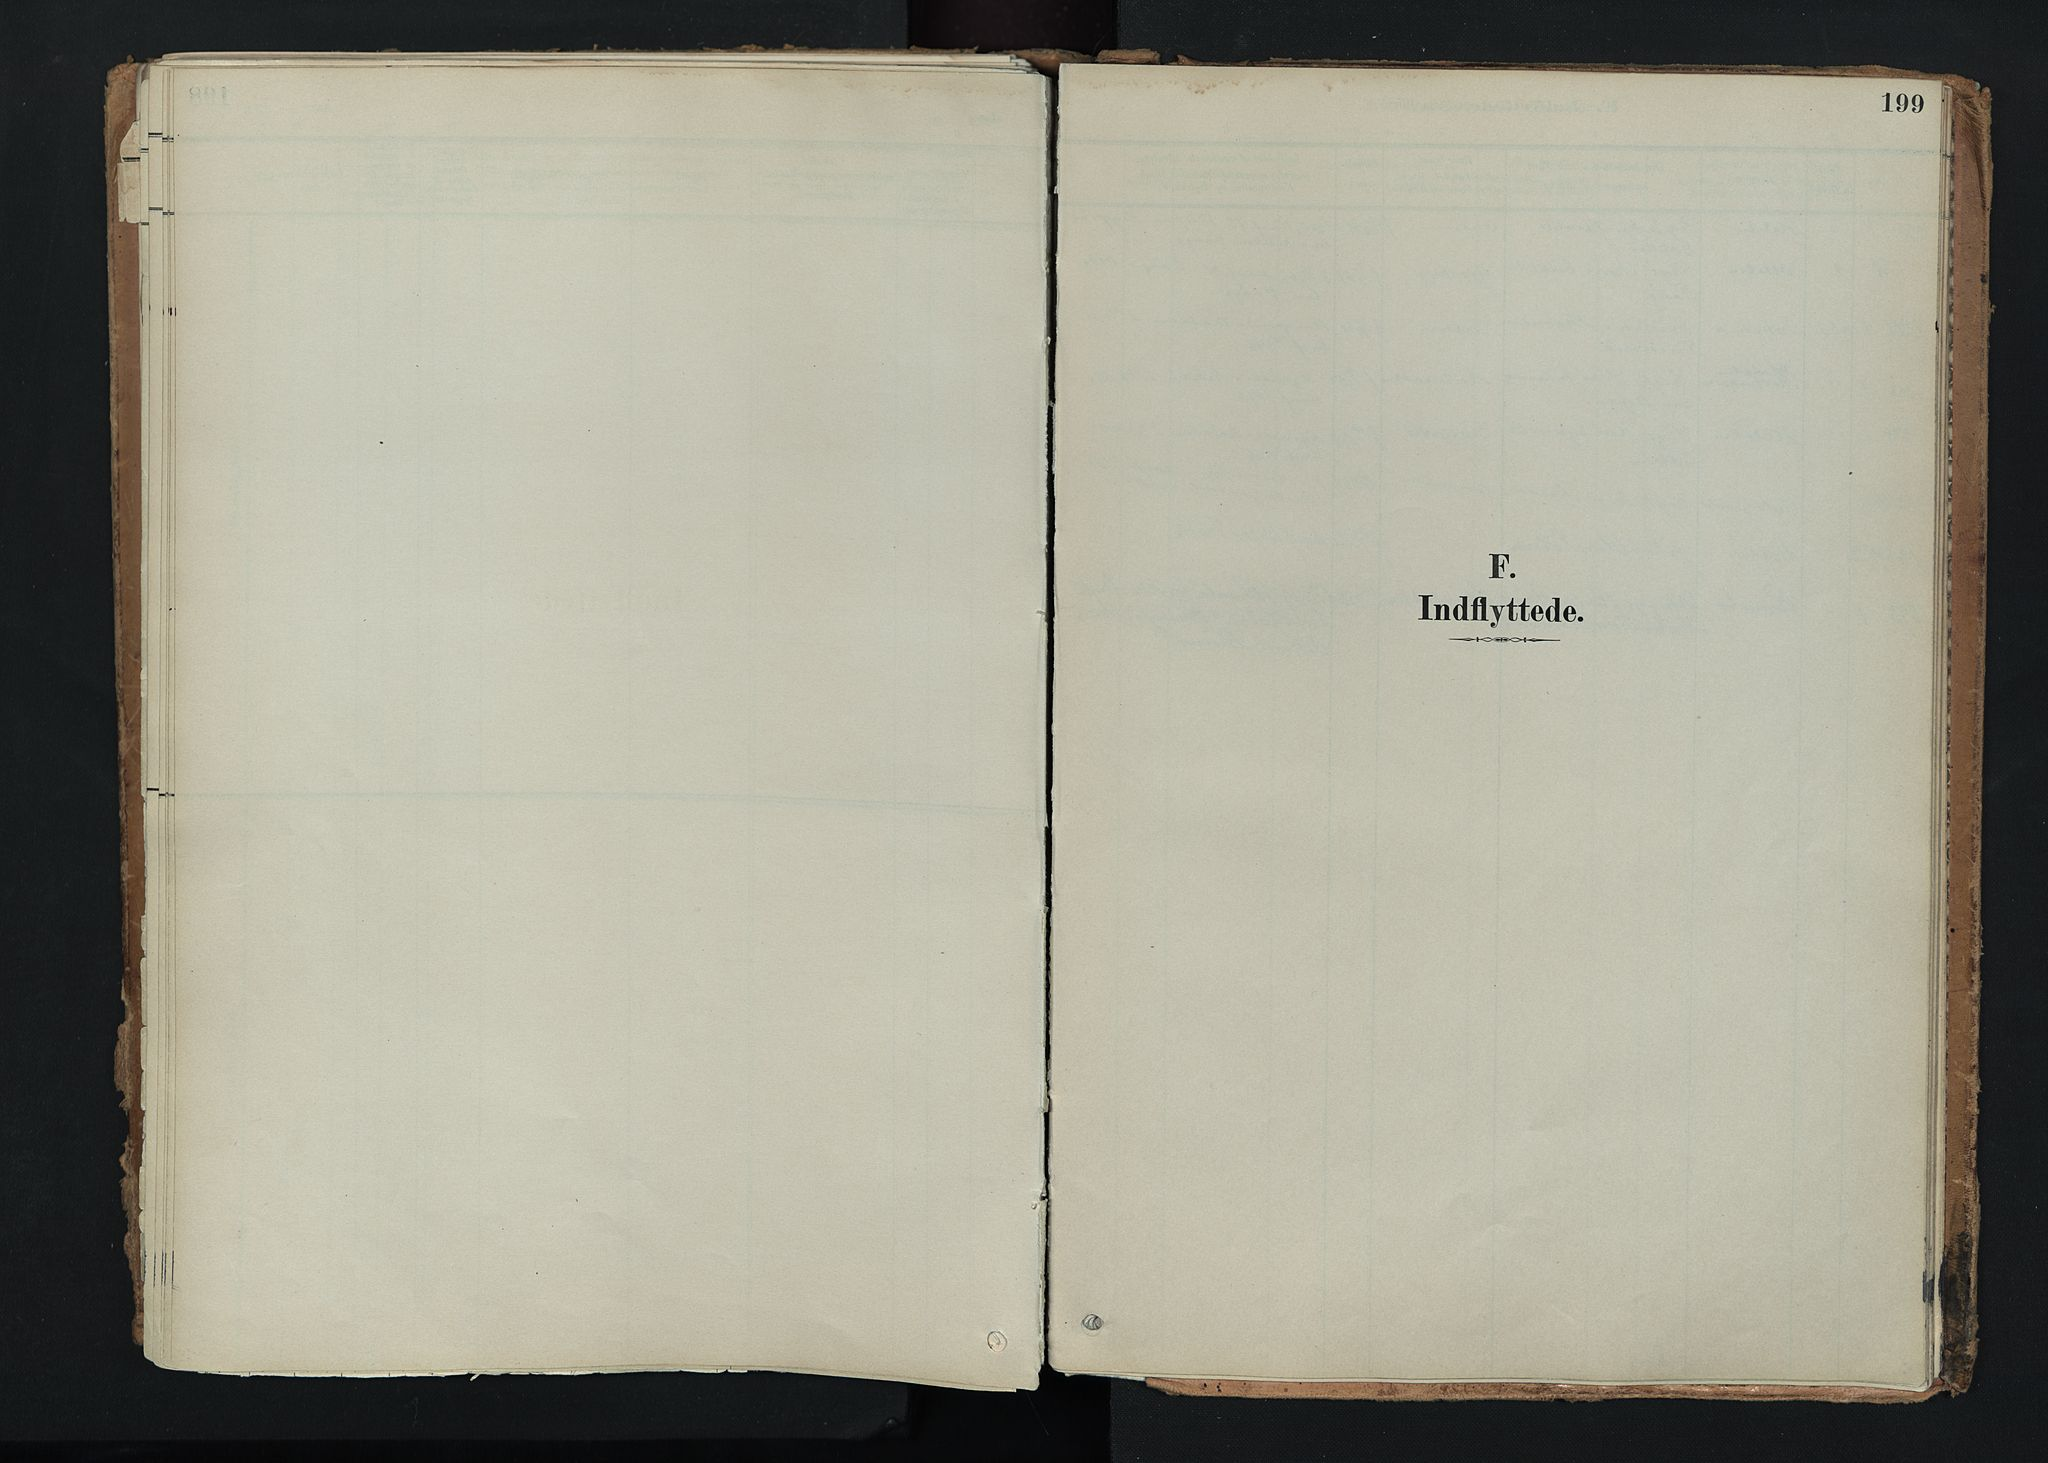 SAH, Nord-Fron prestekontor, Ministerialbok nr. 5, 1884-1914, s. 199